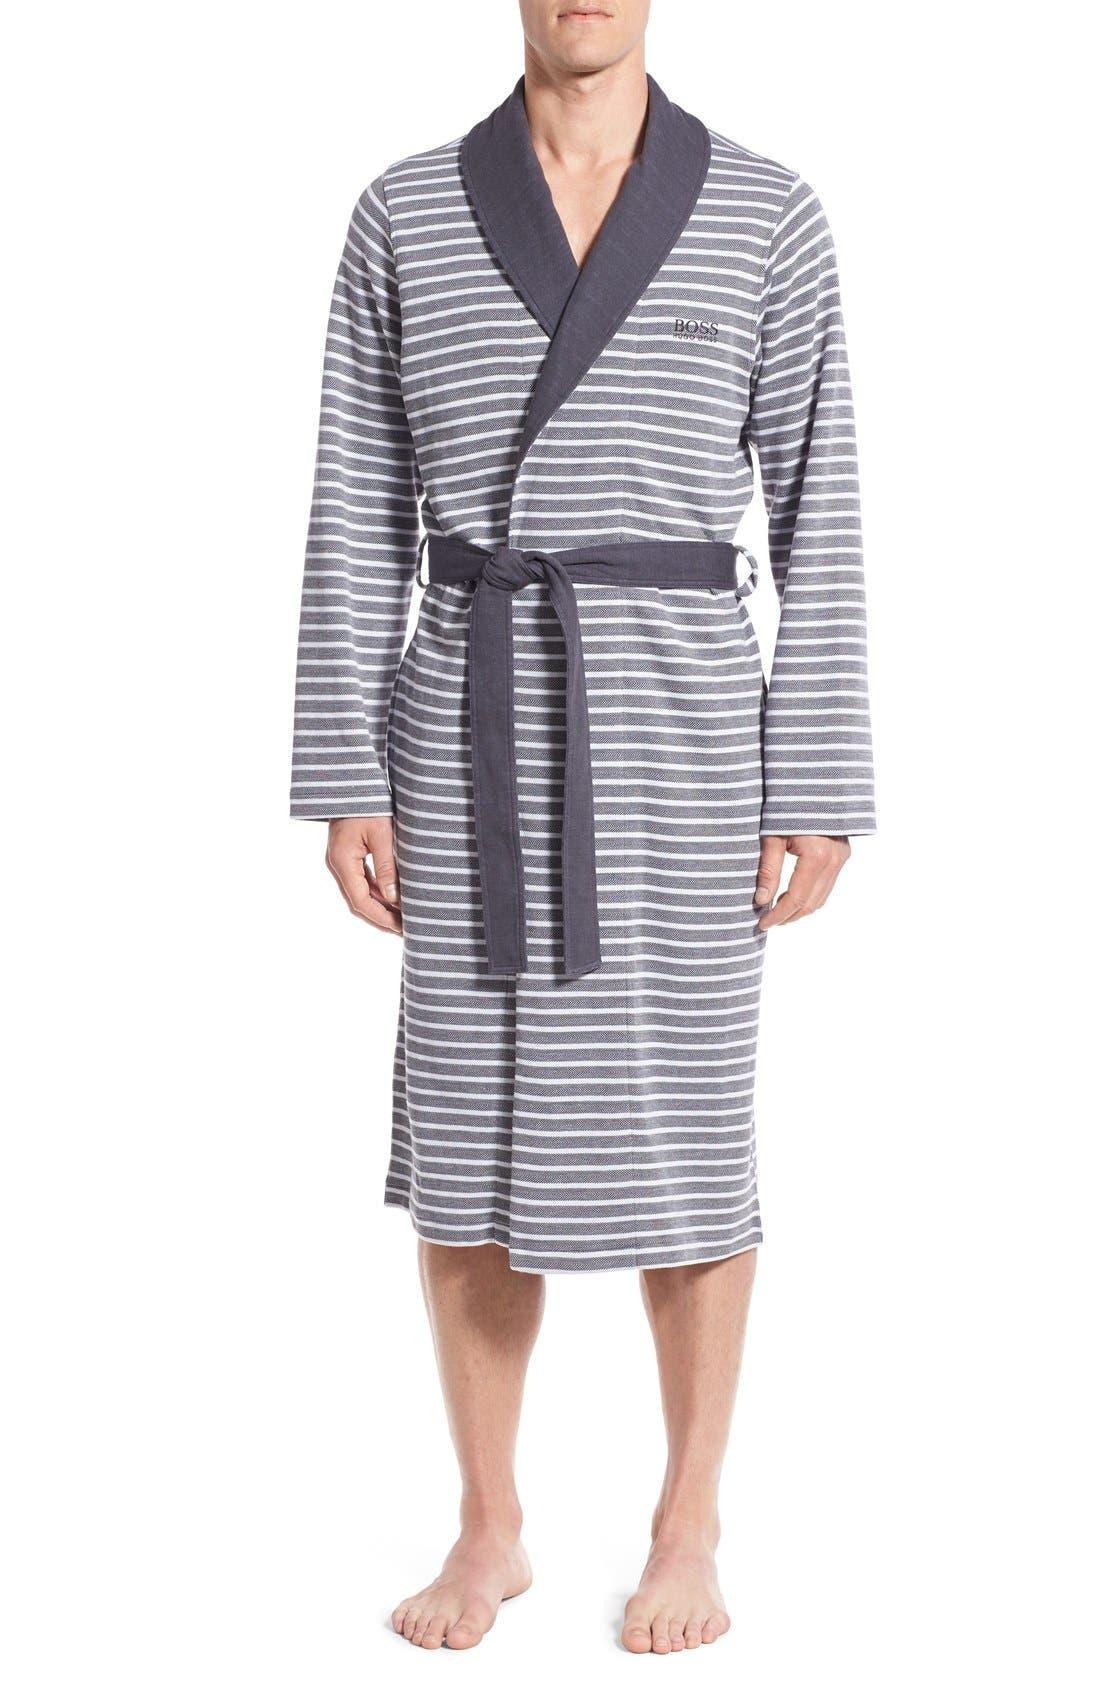 Alternate Image 1 Selected - BOSS 'Maritime' Shawl Collar Robe